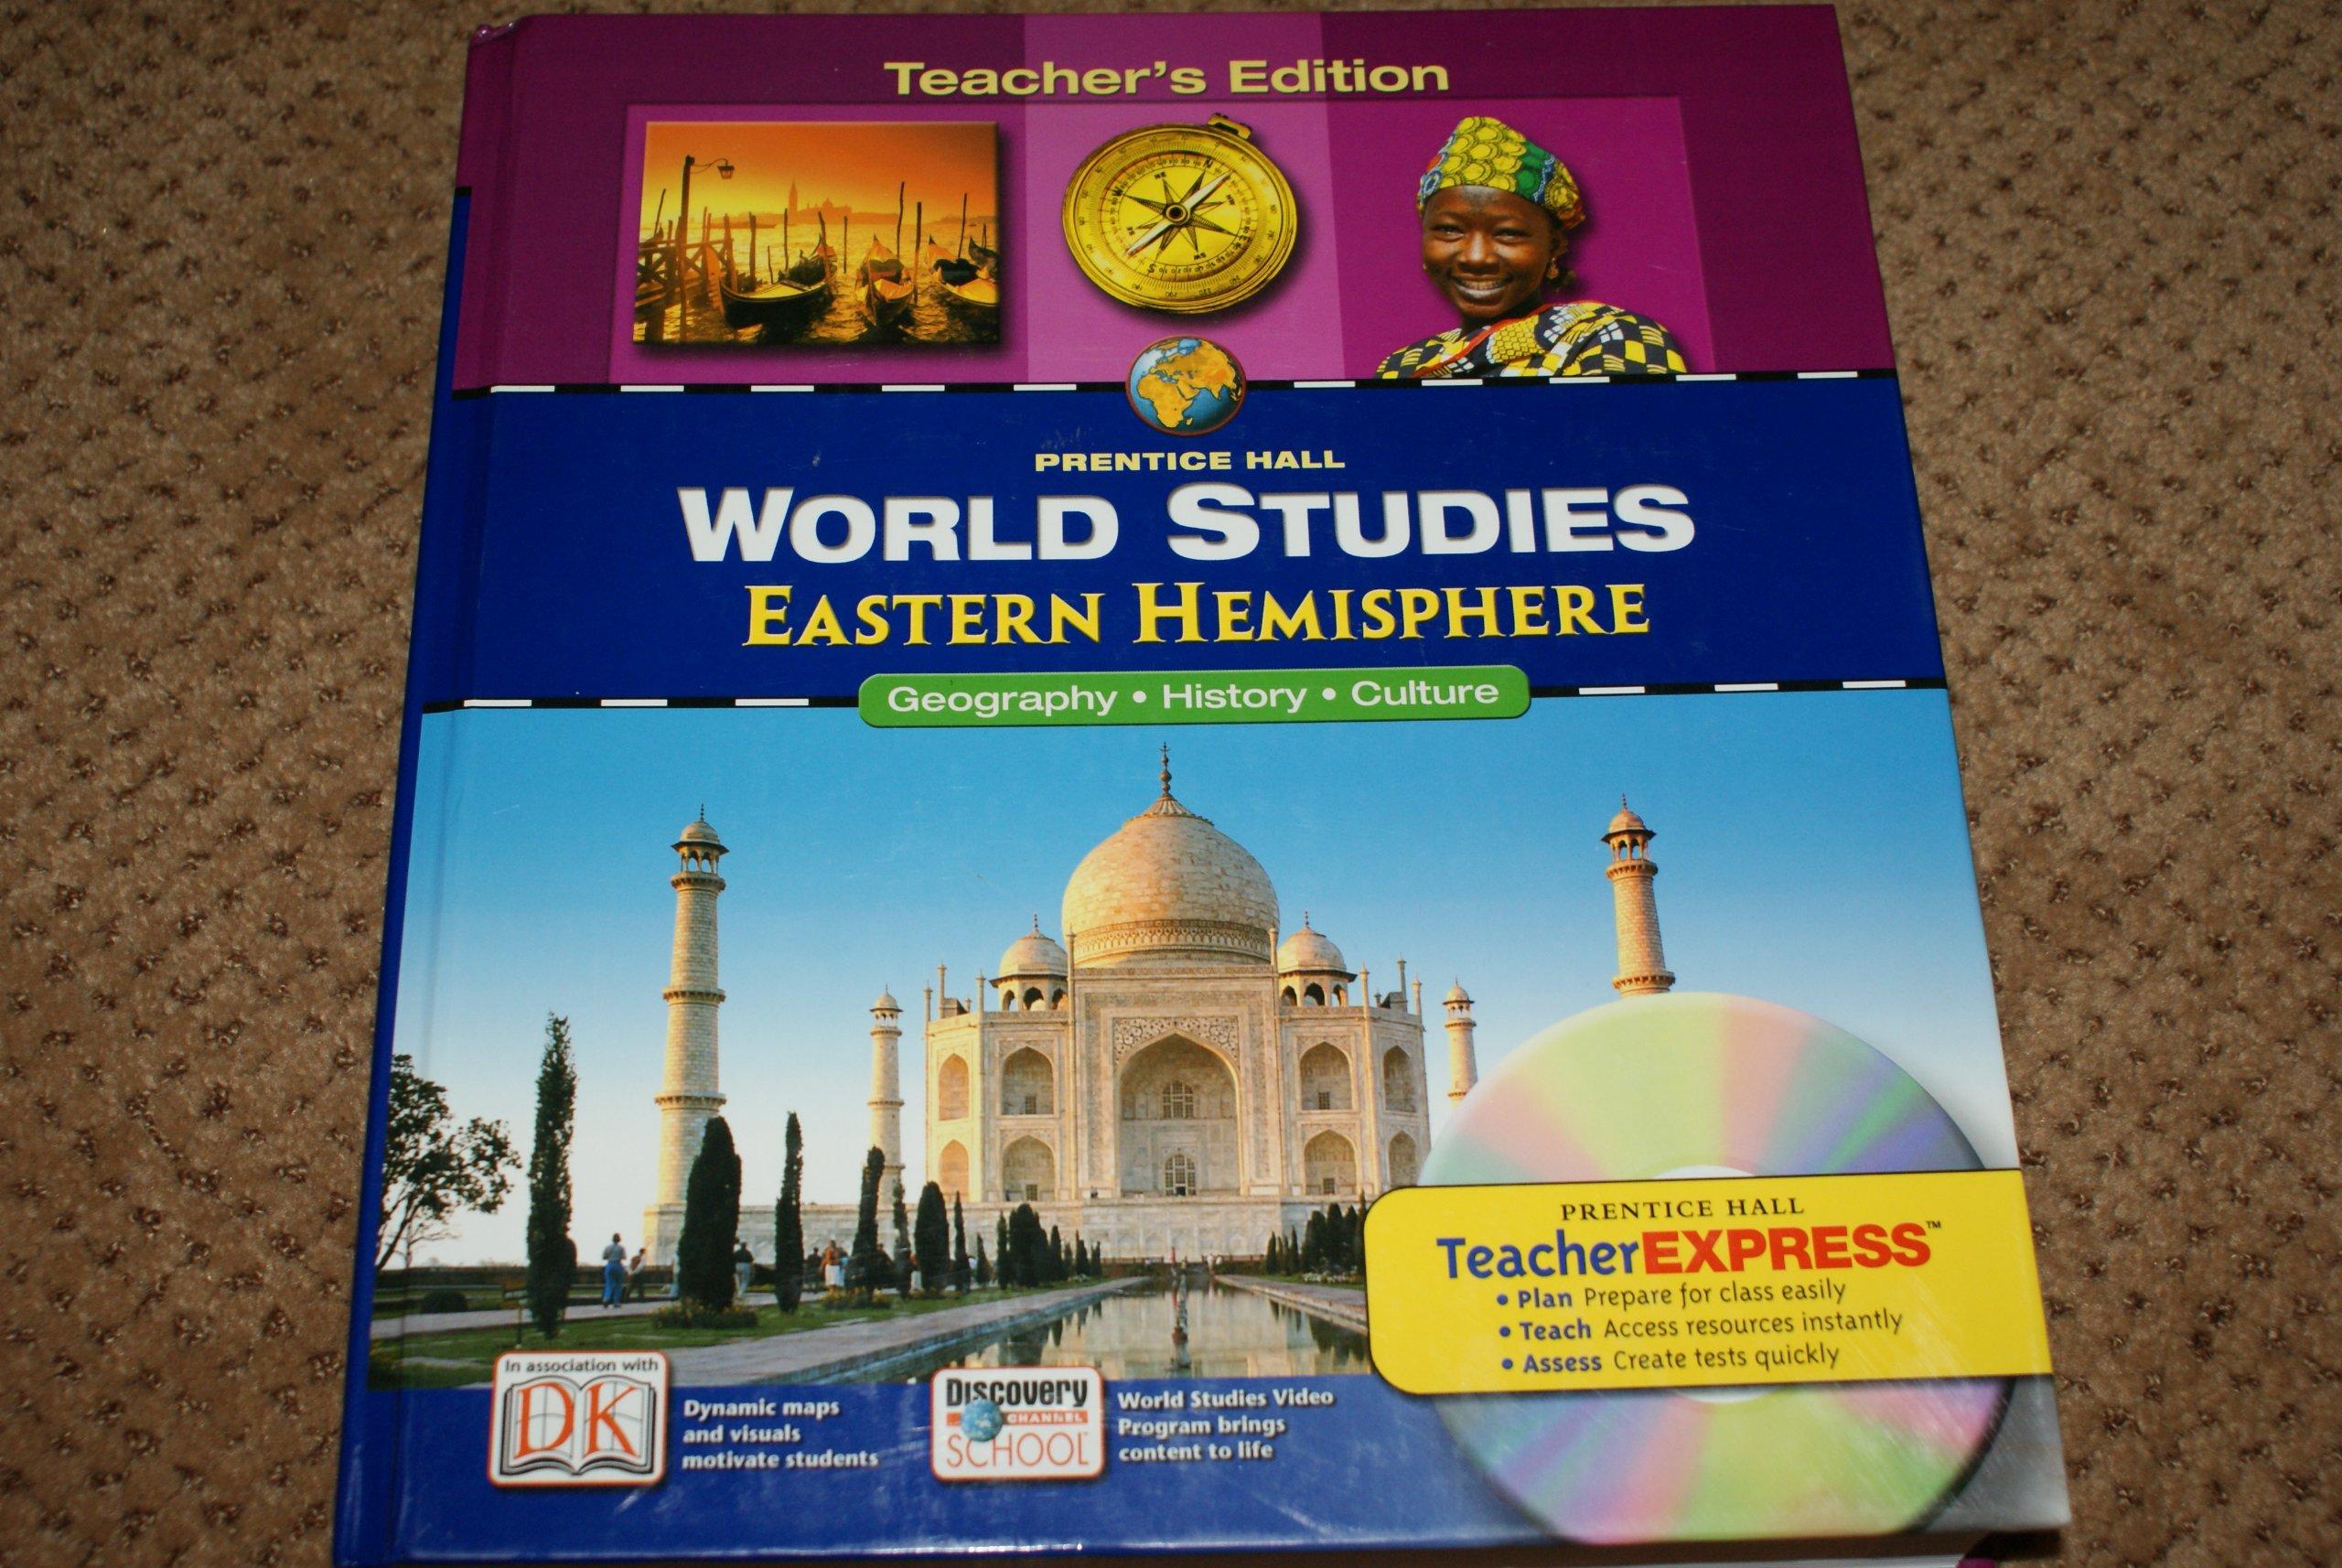 World Studies, Eastern Hemisphere: Geography, History, Culture, Teacher's  Edition: Prentice Hall: 9780131280816: Amazon.com: Books